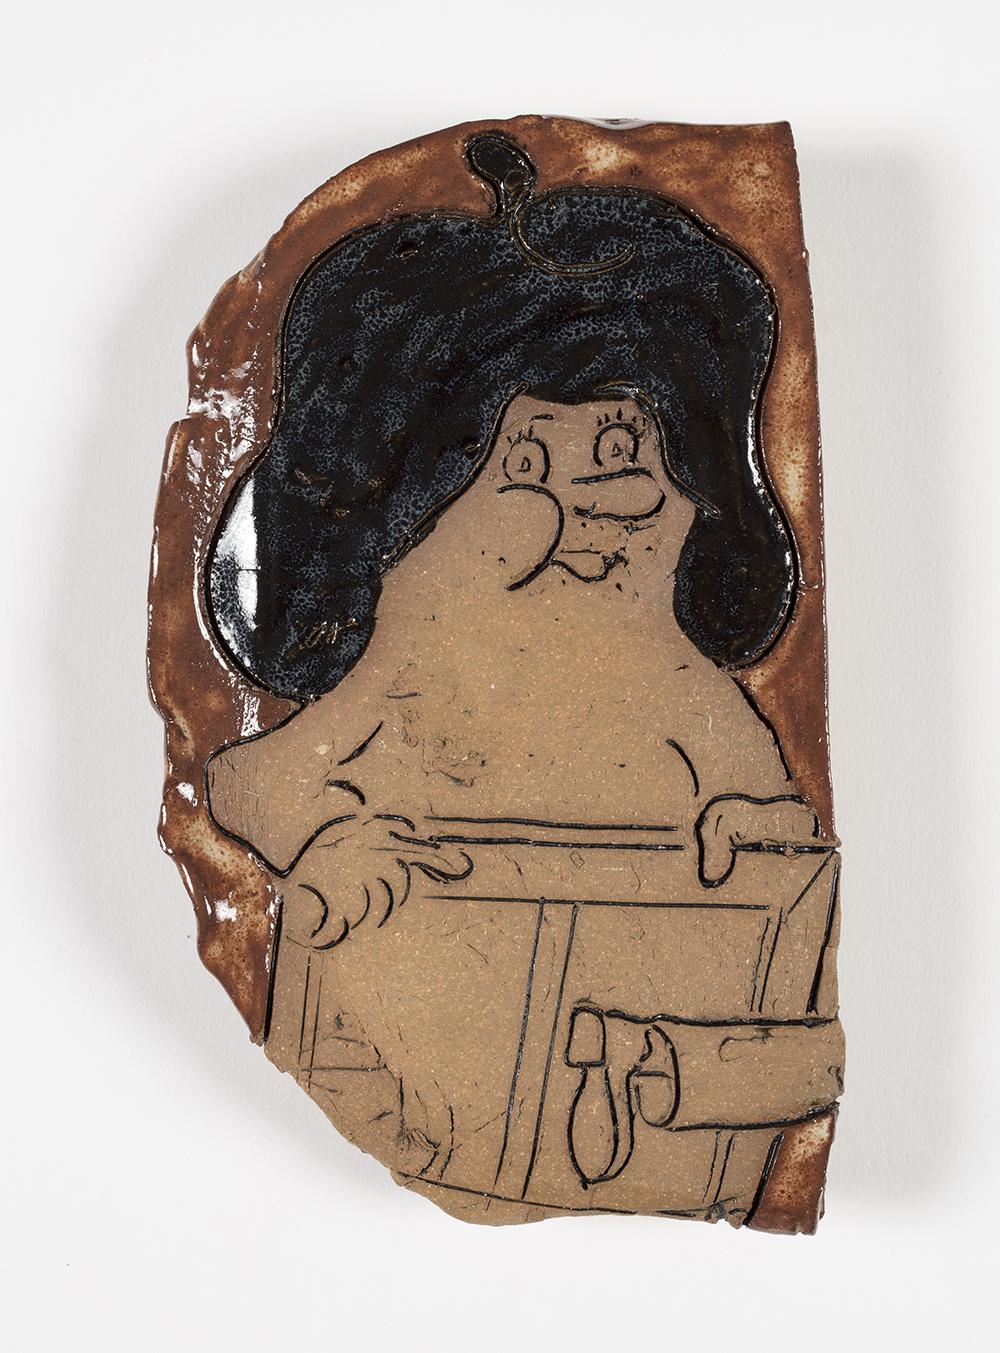 Kevin McNamee-Tweed.<em> Moonlighter</em>, 2019. Glazed ceramic, 7 x 4 inches (17.8 x 10.2 cm)